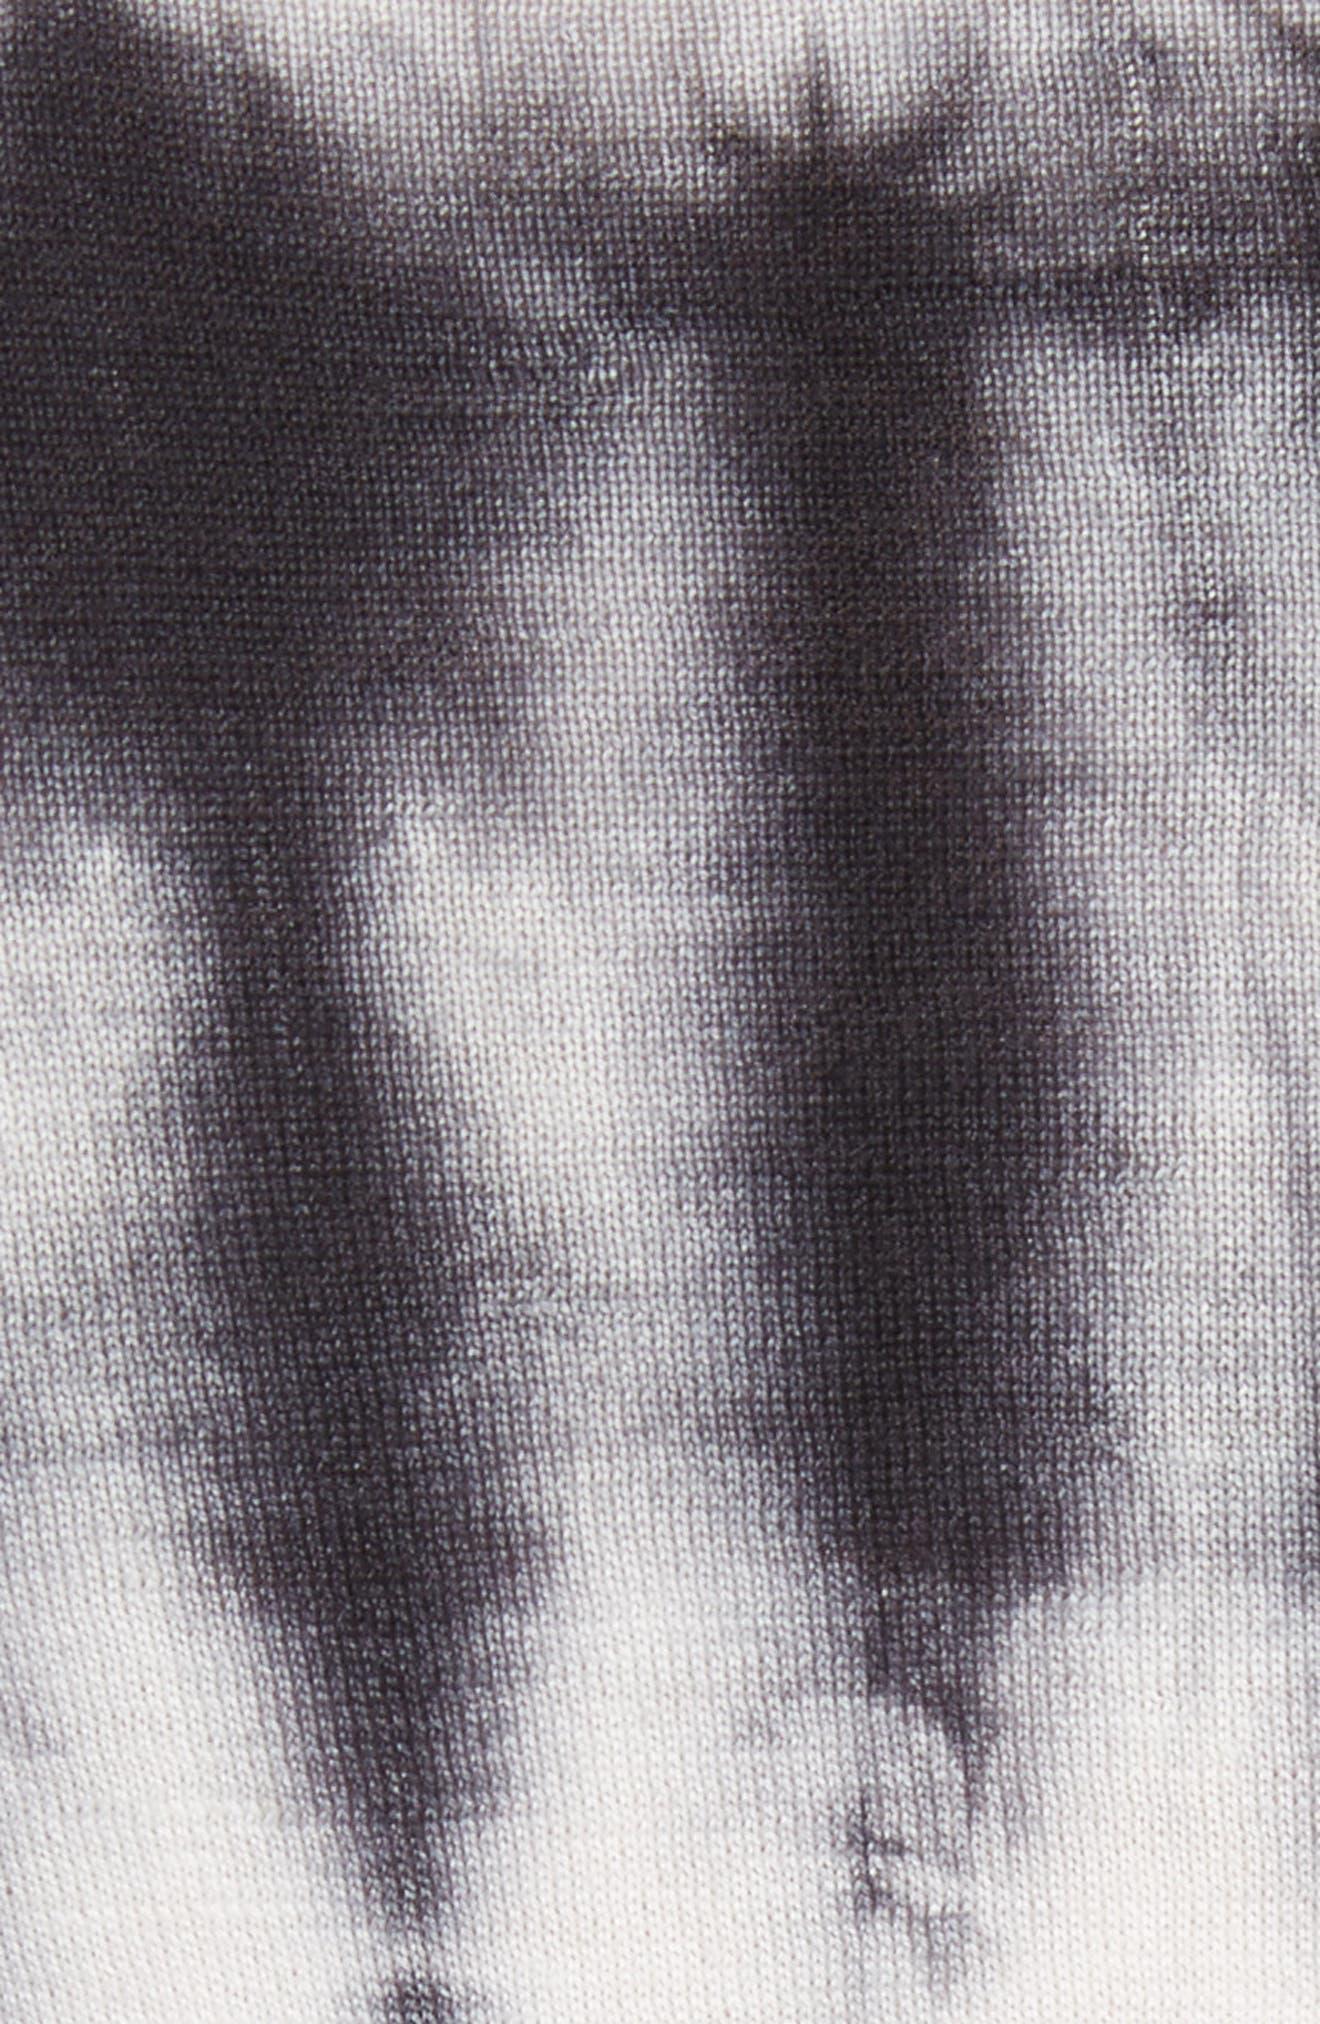 Tie Dye Wool Sweater,                             Alternate thumbnail 5, color,